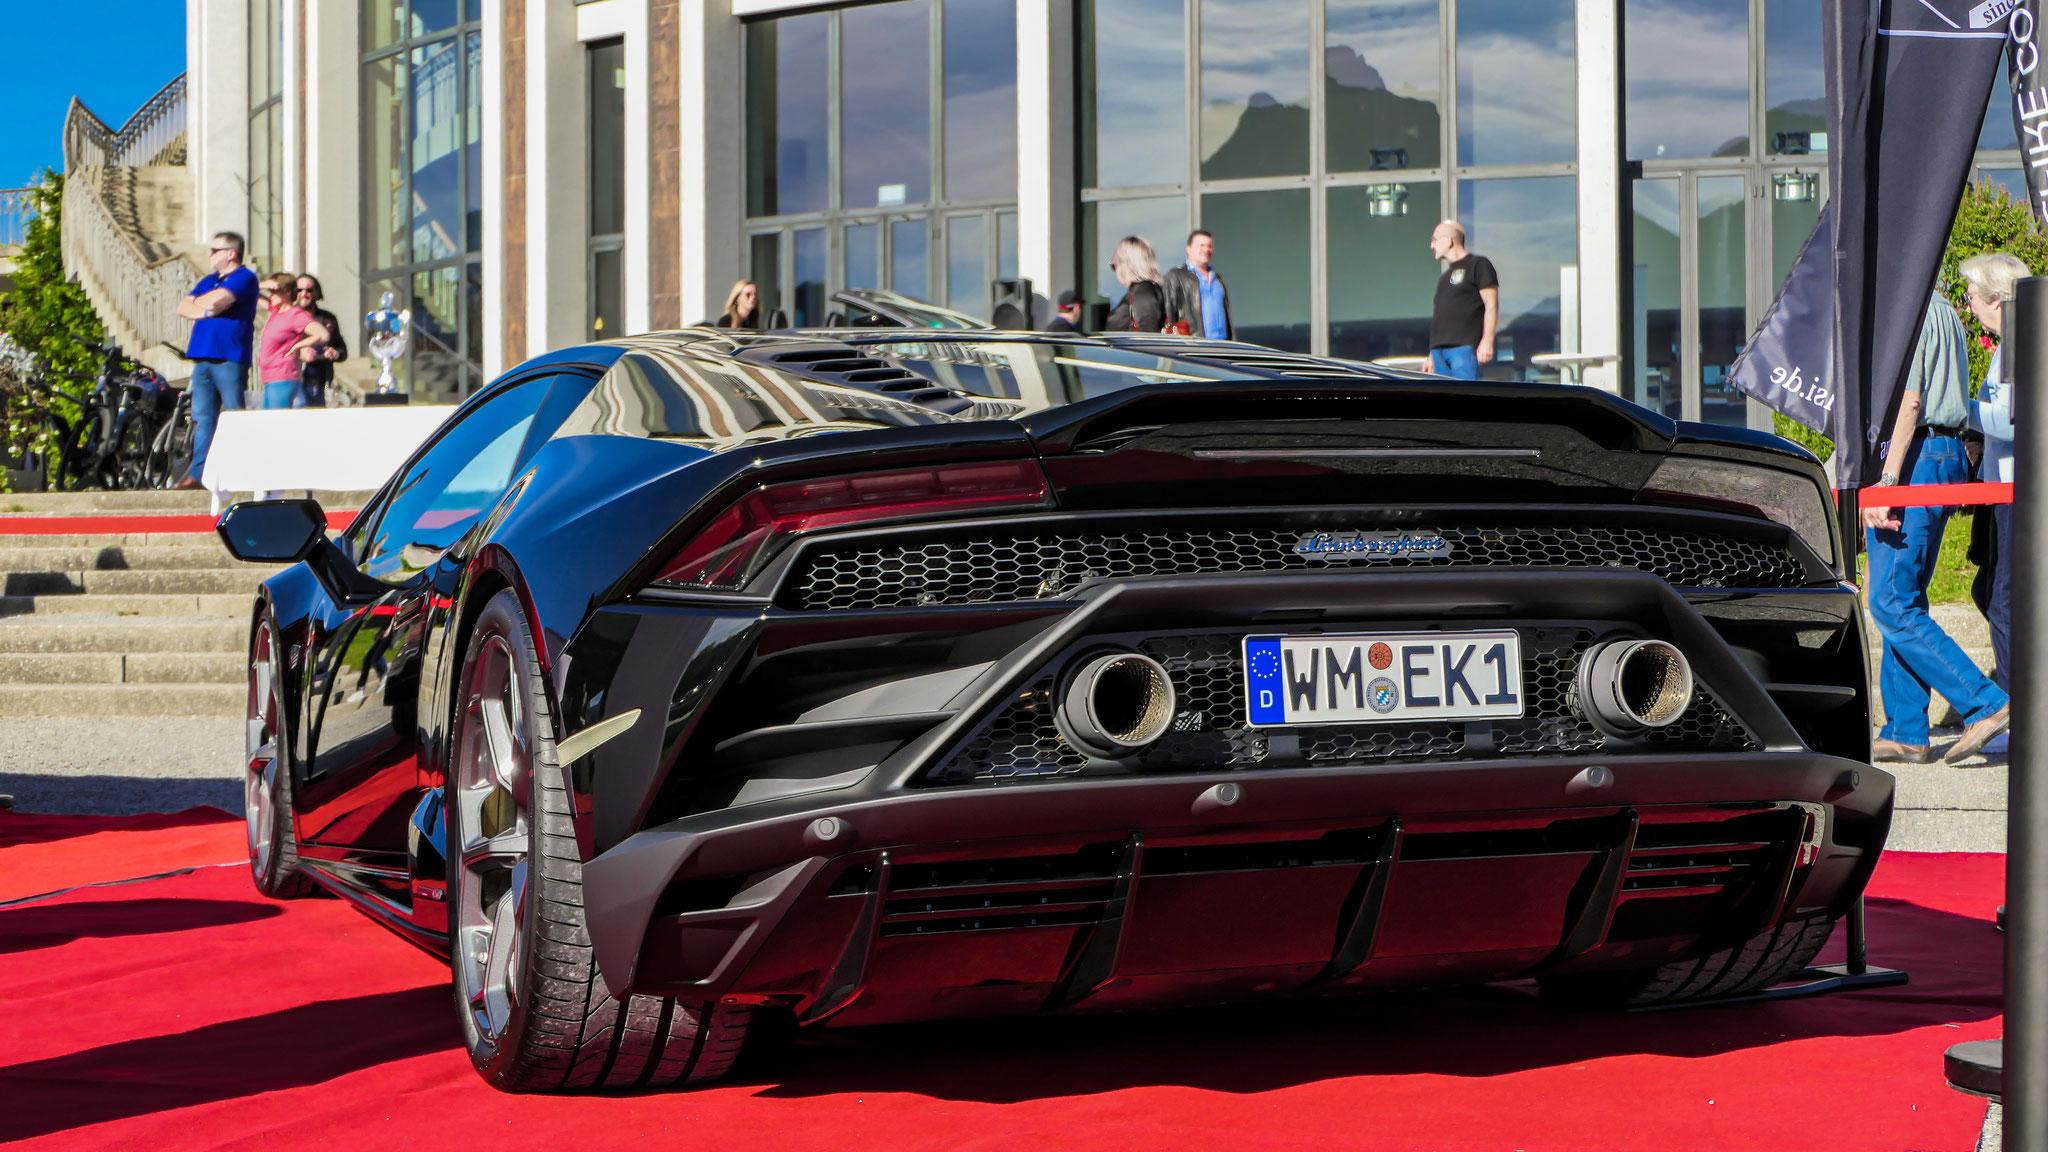 Lamborghini Huracan Evo - WM-EK-1